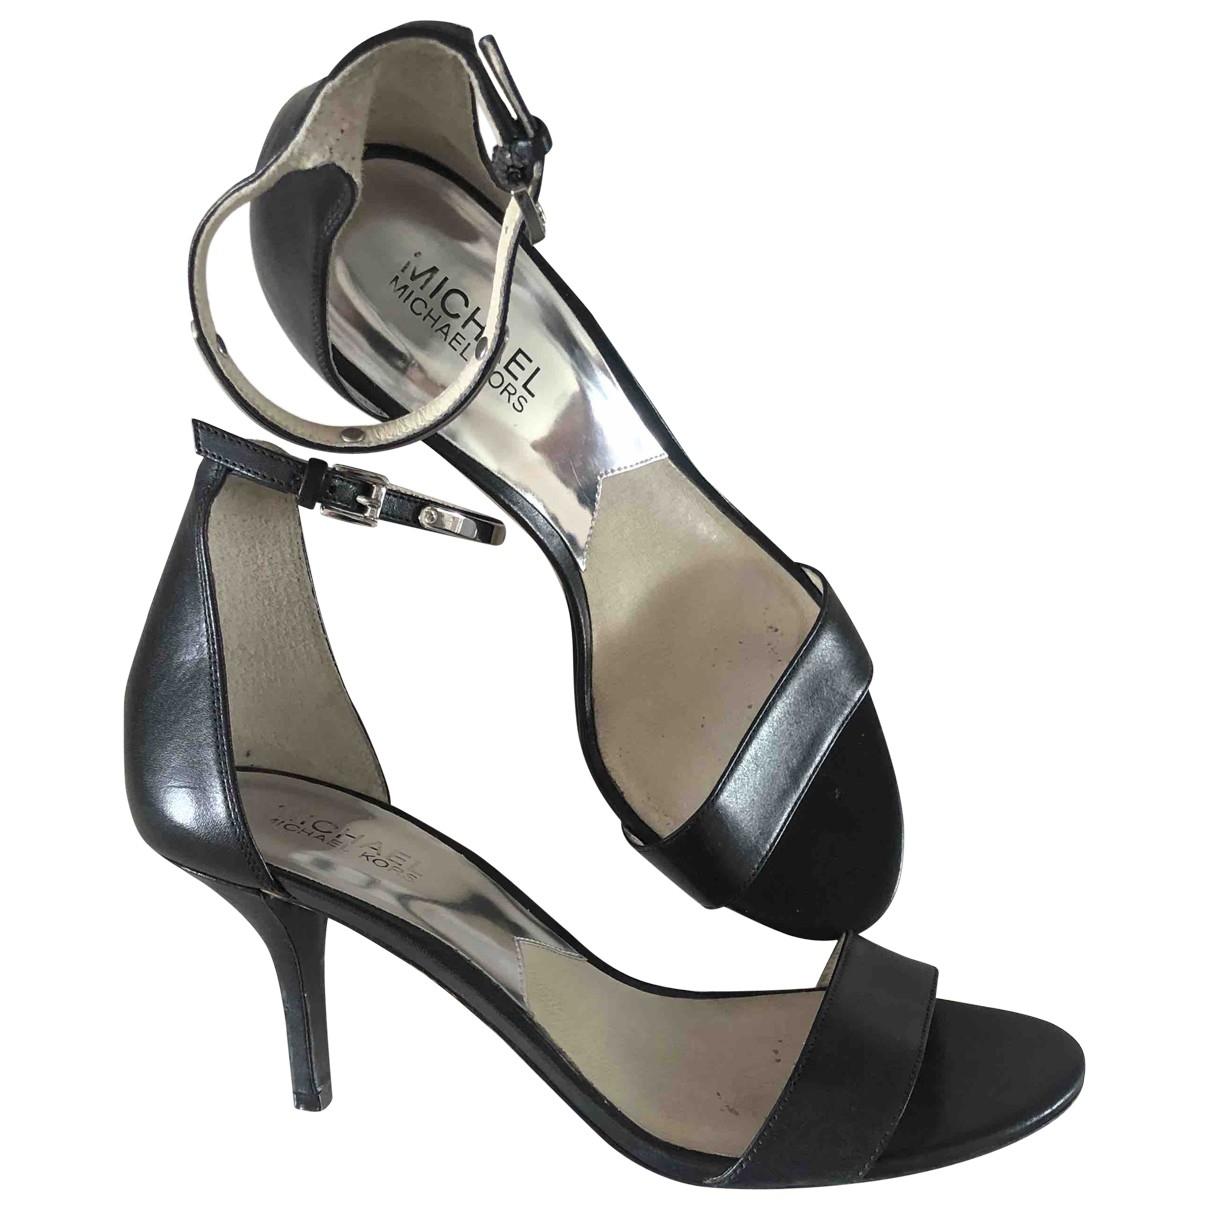 Michael Kors \N Black Leather Heels for Women 8.5 US